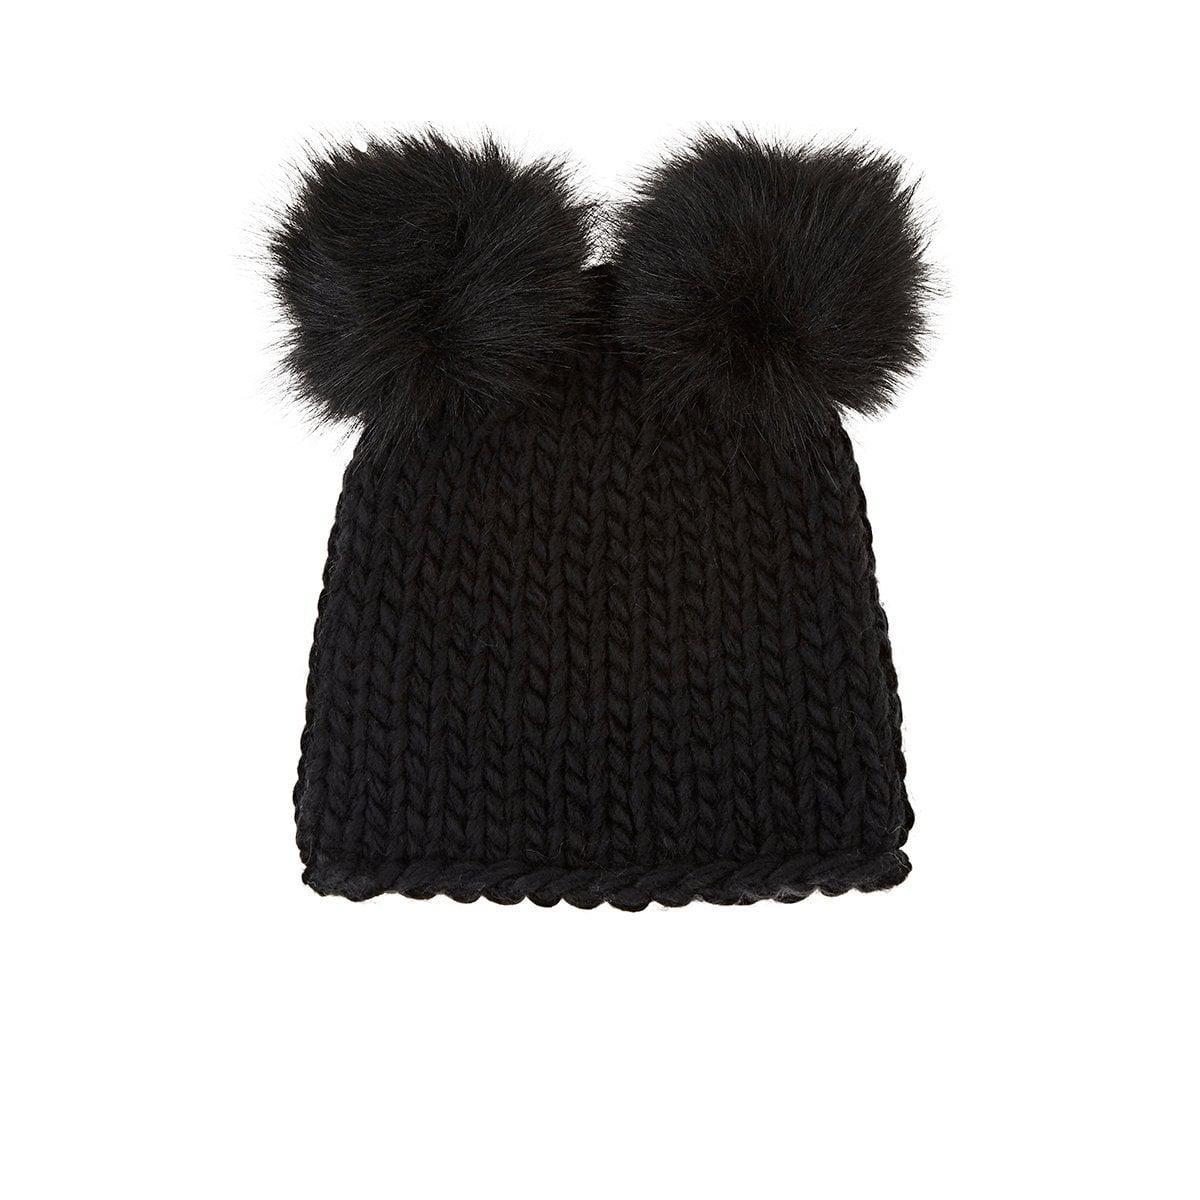 3ec99fbb2 Barneys New York Wool-blend Double Pom-pom Hat in Black - Lyst